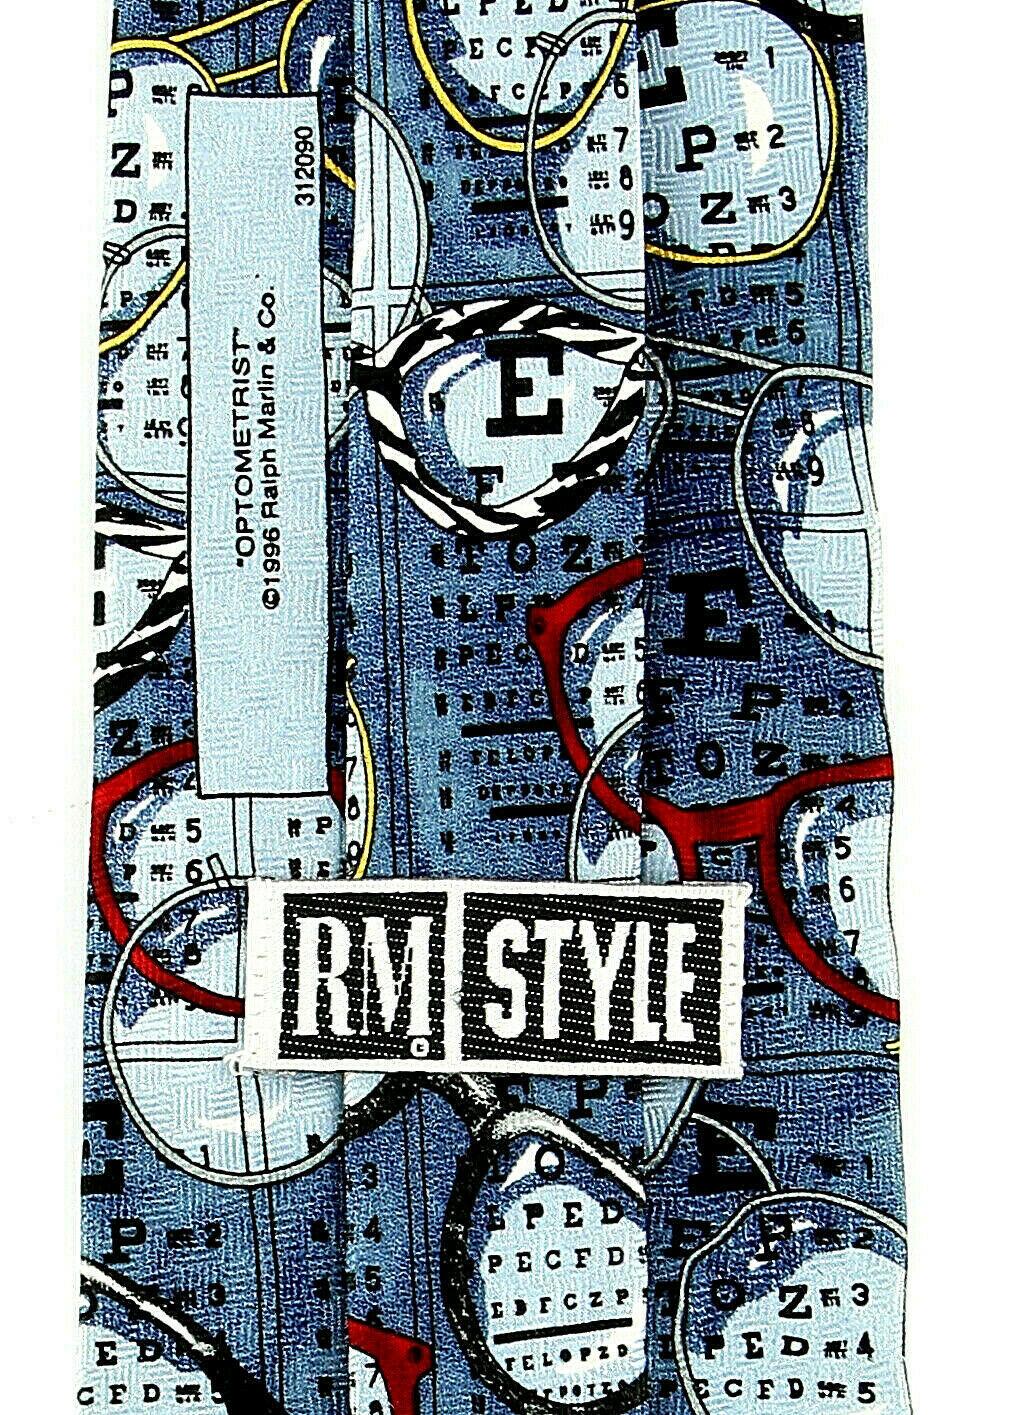 Optometrist Men's Neck Tie Ralph Marlin Eye Doctor Eyeglasses Silk Blue Neck Tie